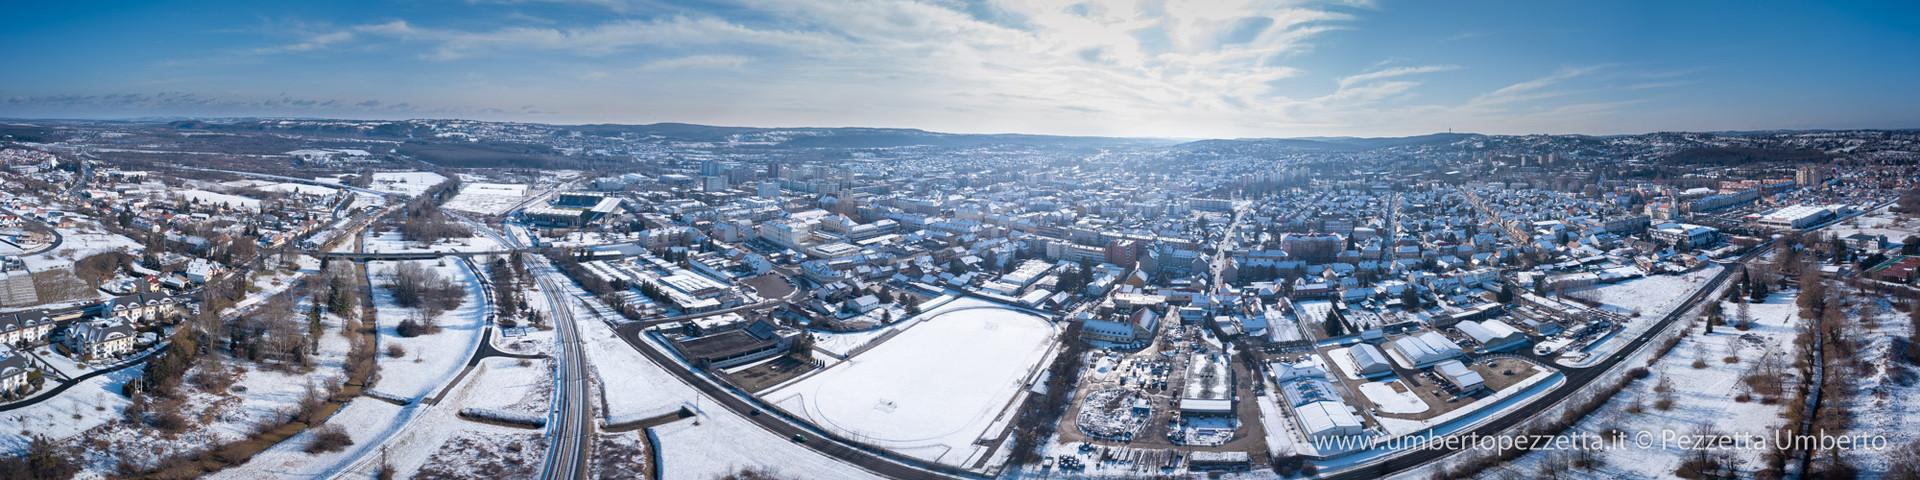 Zalaegerszeg from North #3